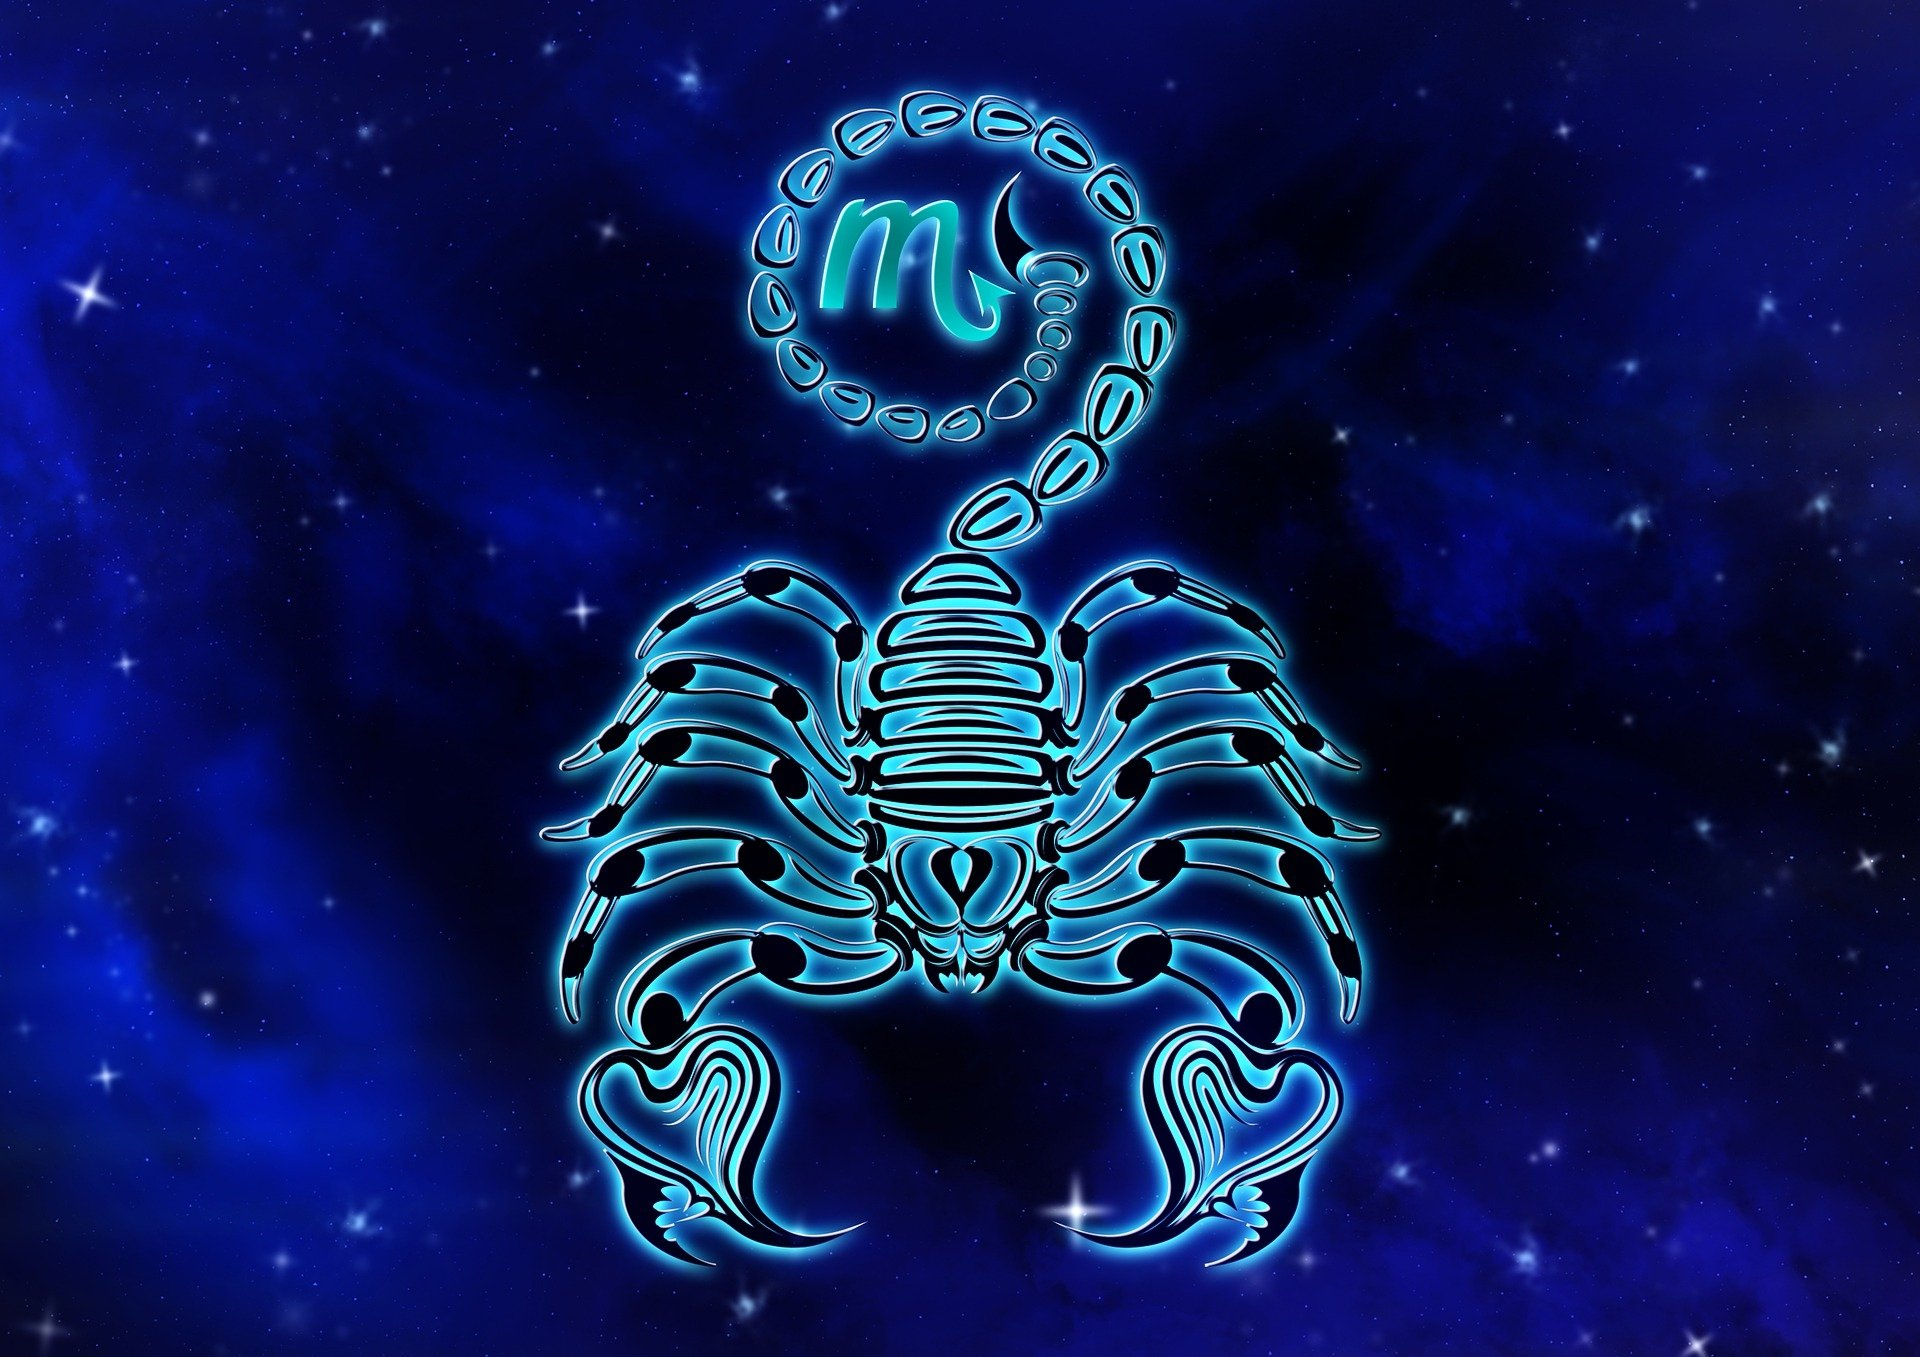 Blue Scorpio the Scorpion HD Wallpaper